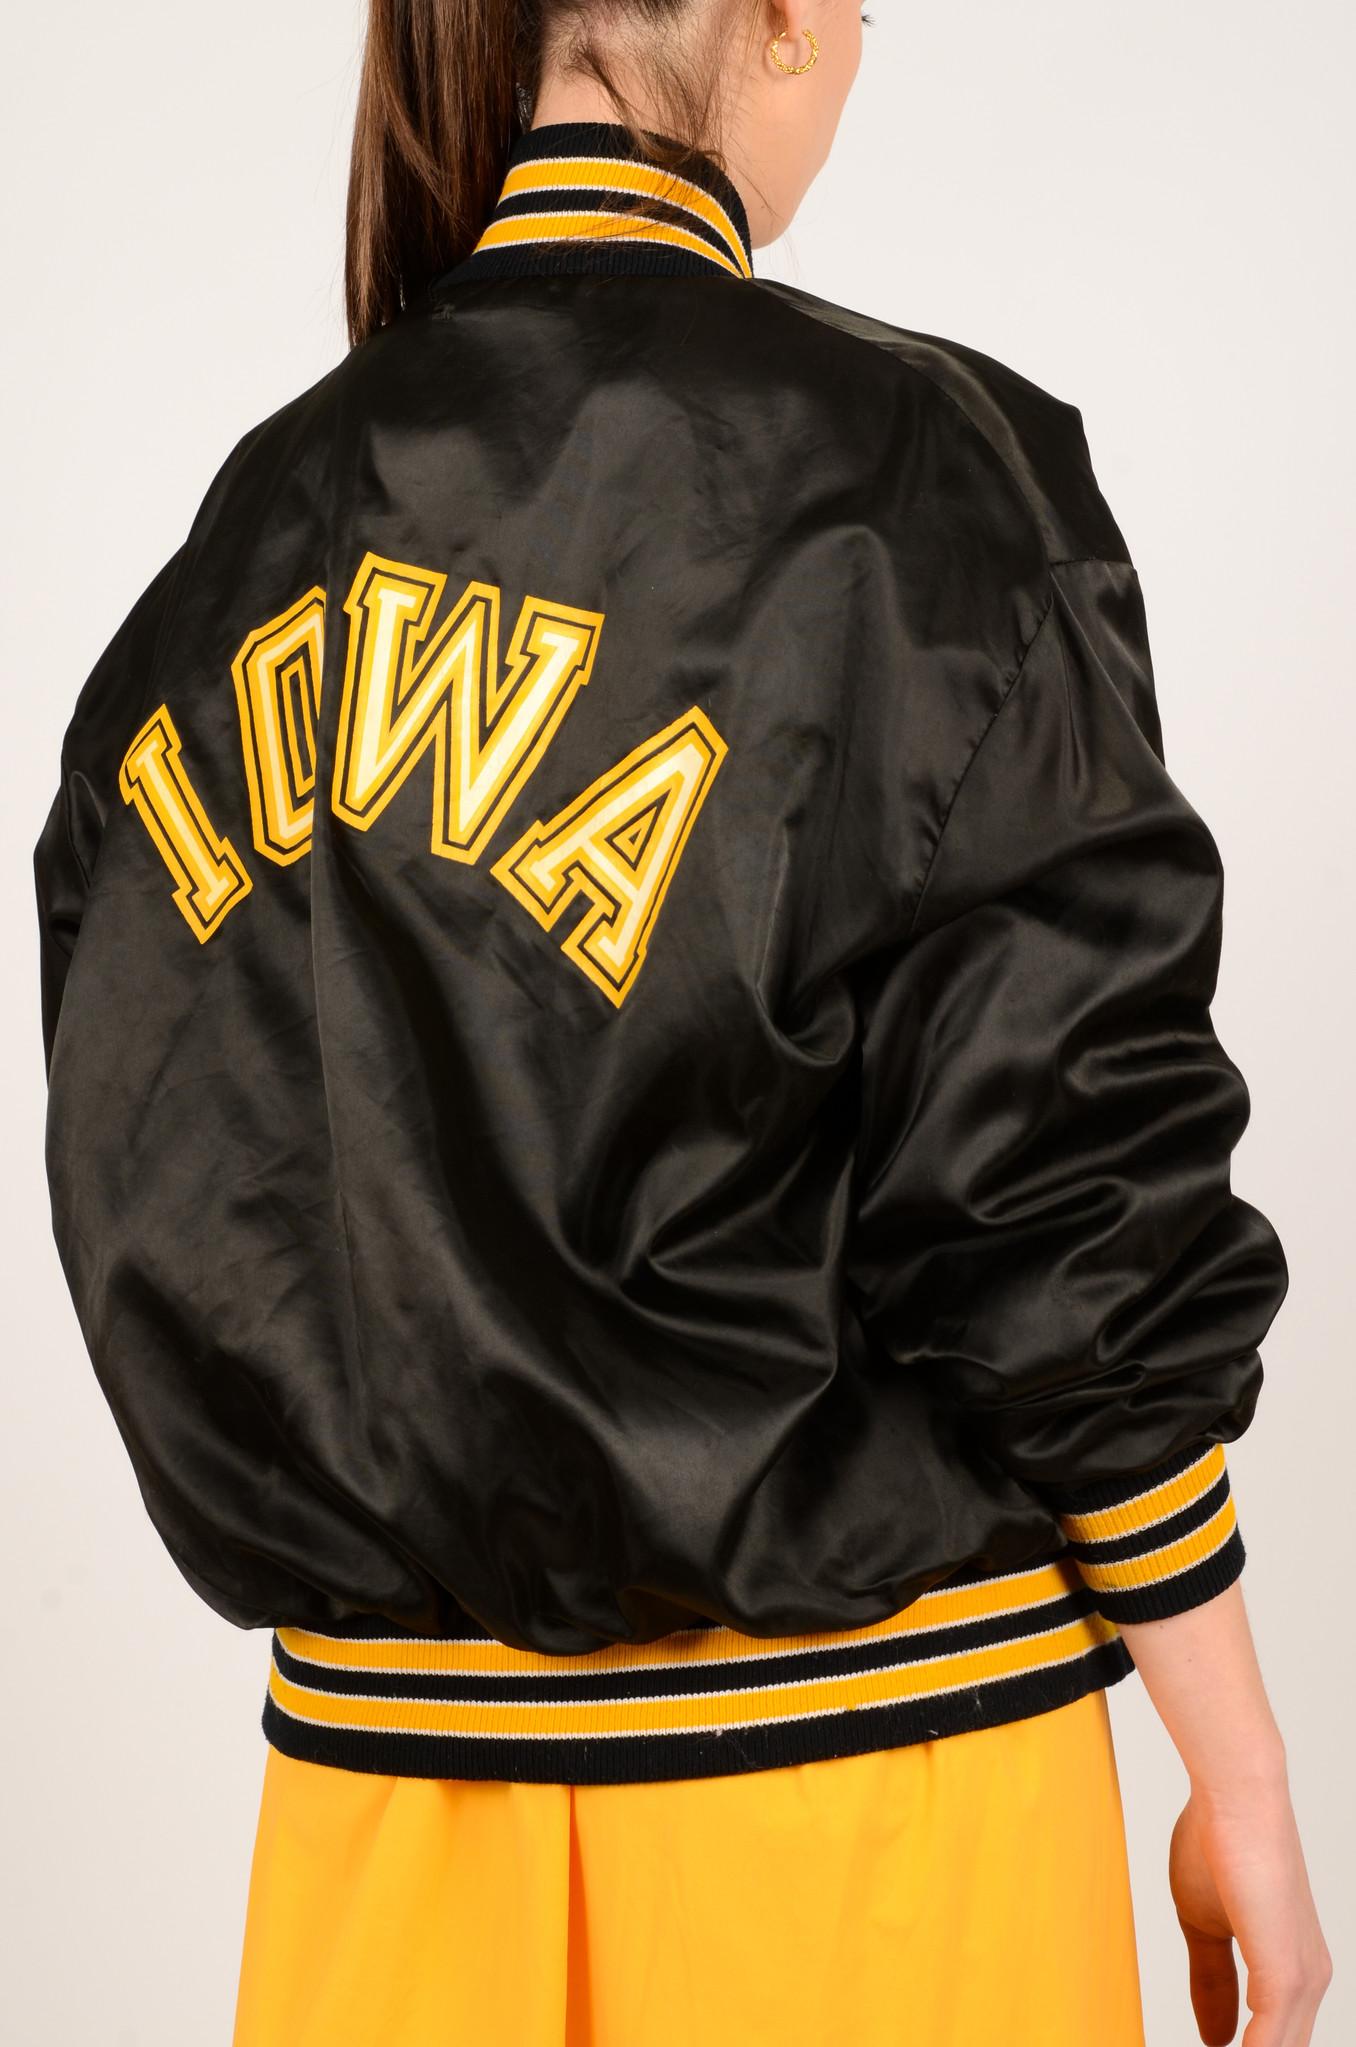 IOWA BLACK NYLON JACKET-4